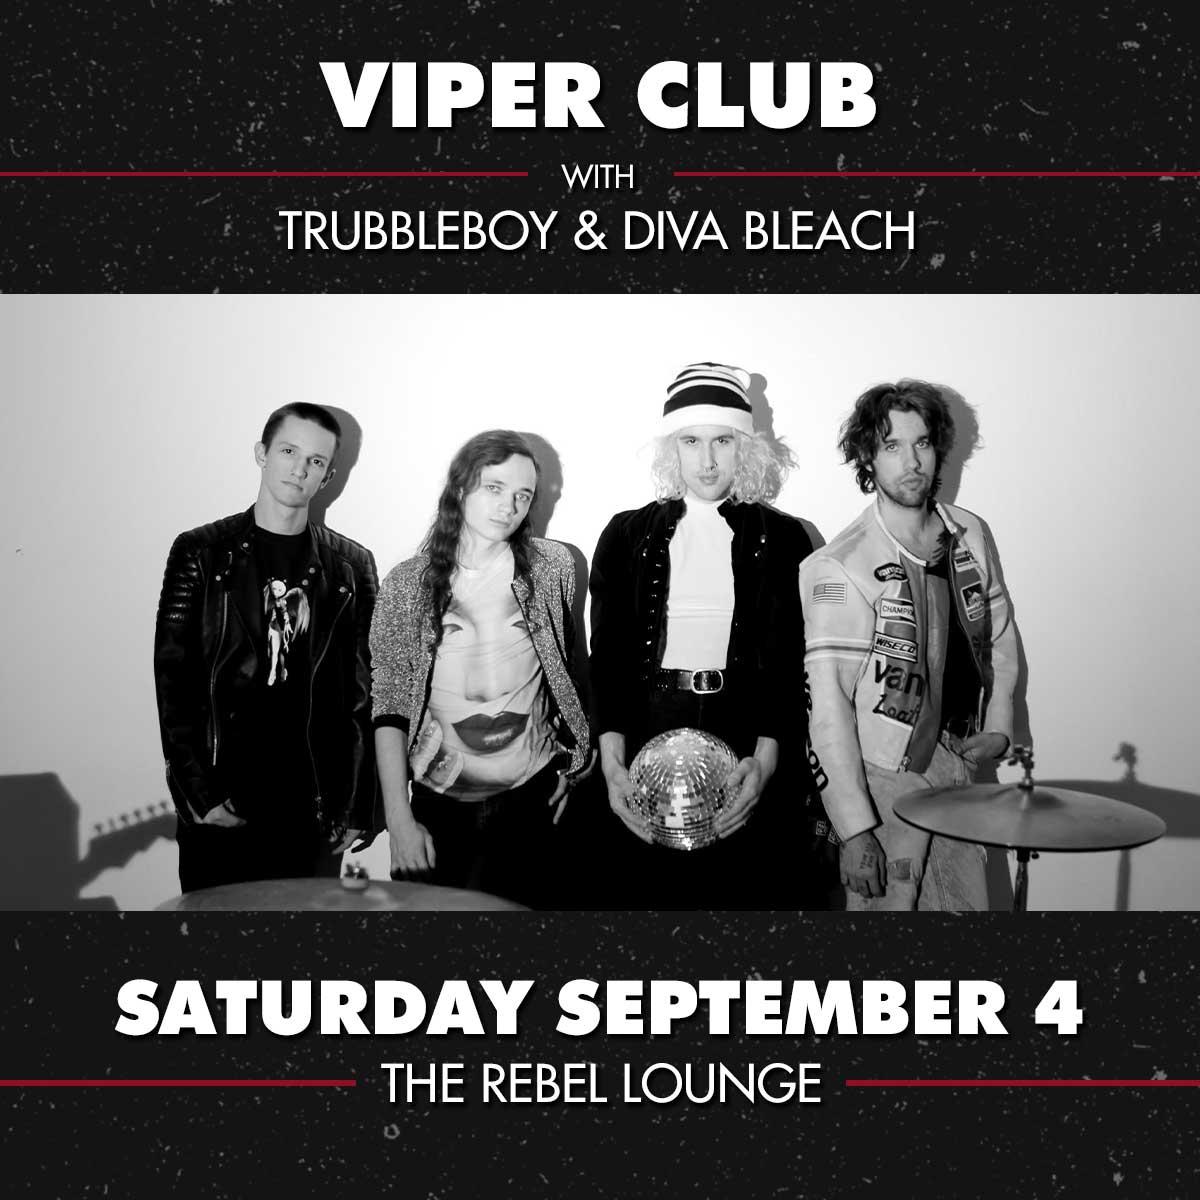 VIPER CLUB: